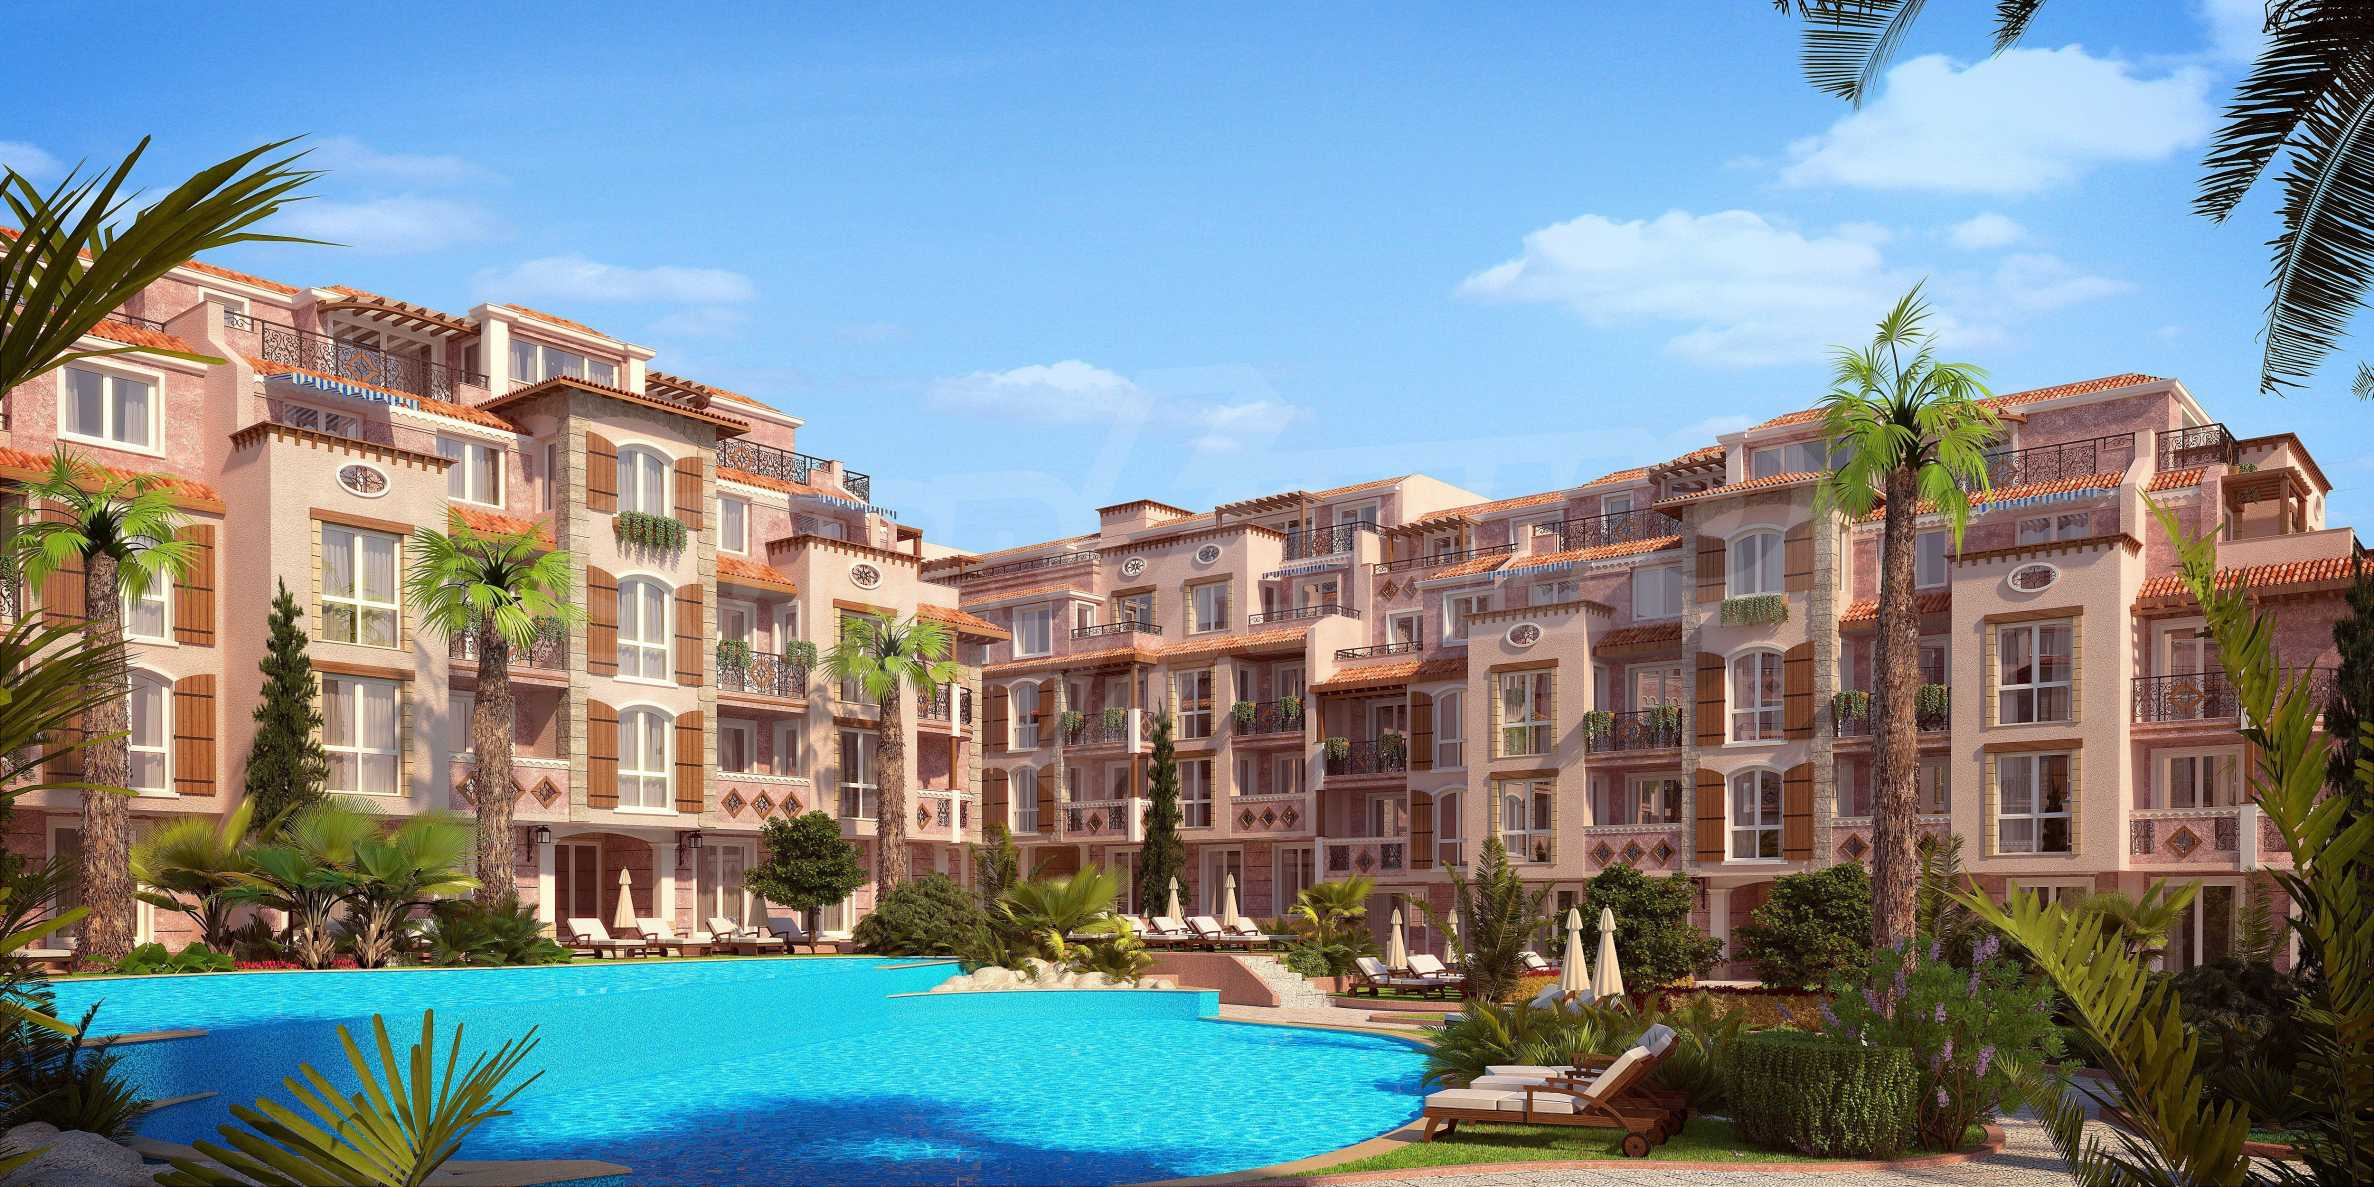 New 1-bedroom apartment in a coastal complex by the Kavatsite Beach (Sozopol) 23